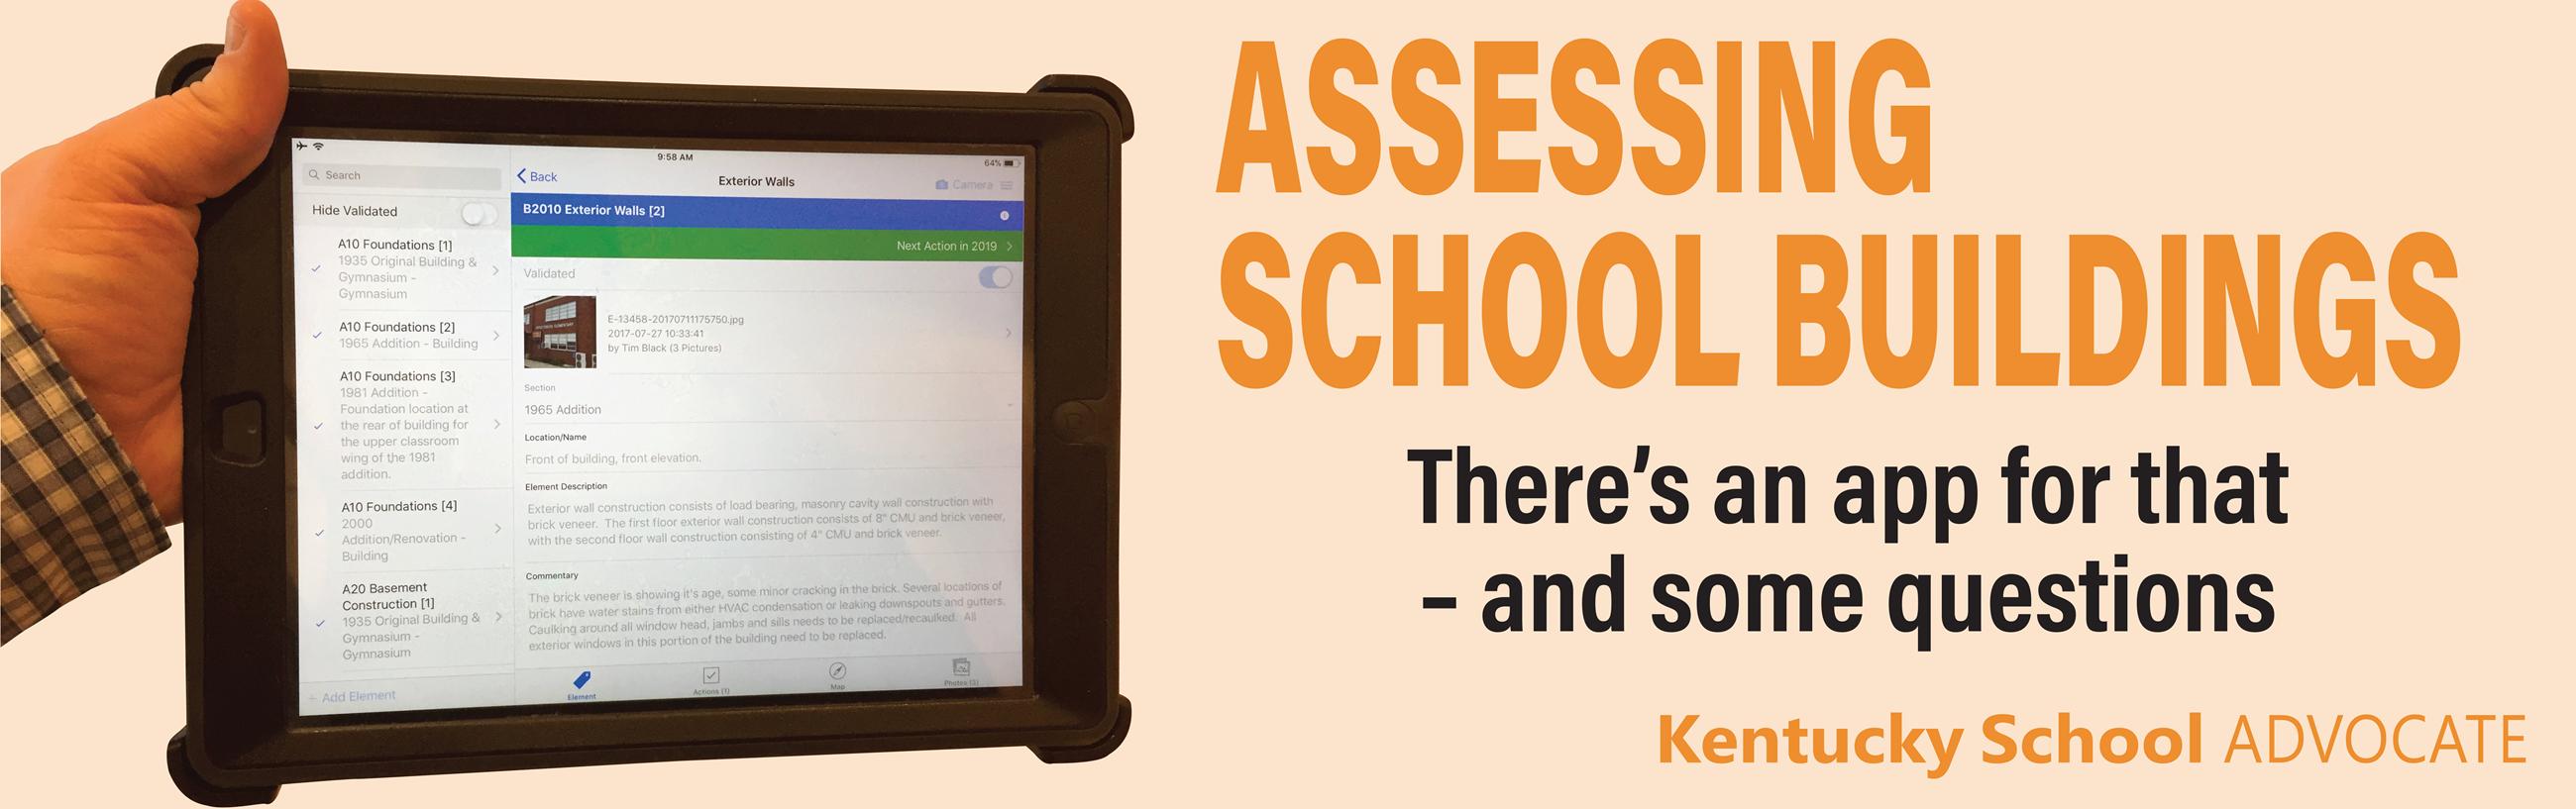 Facilities assessments